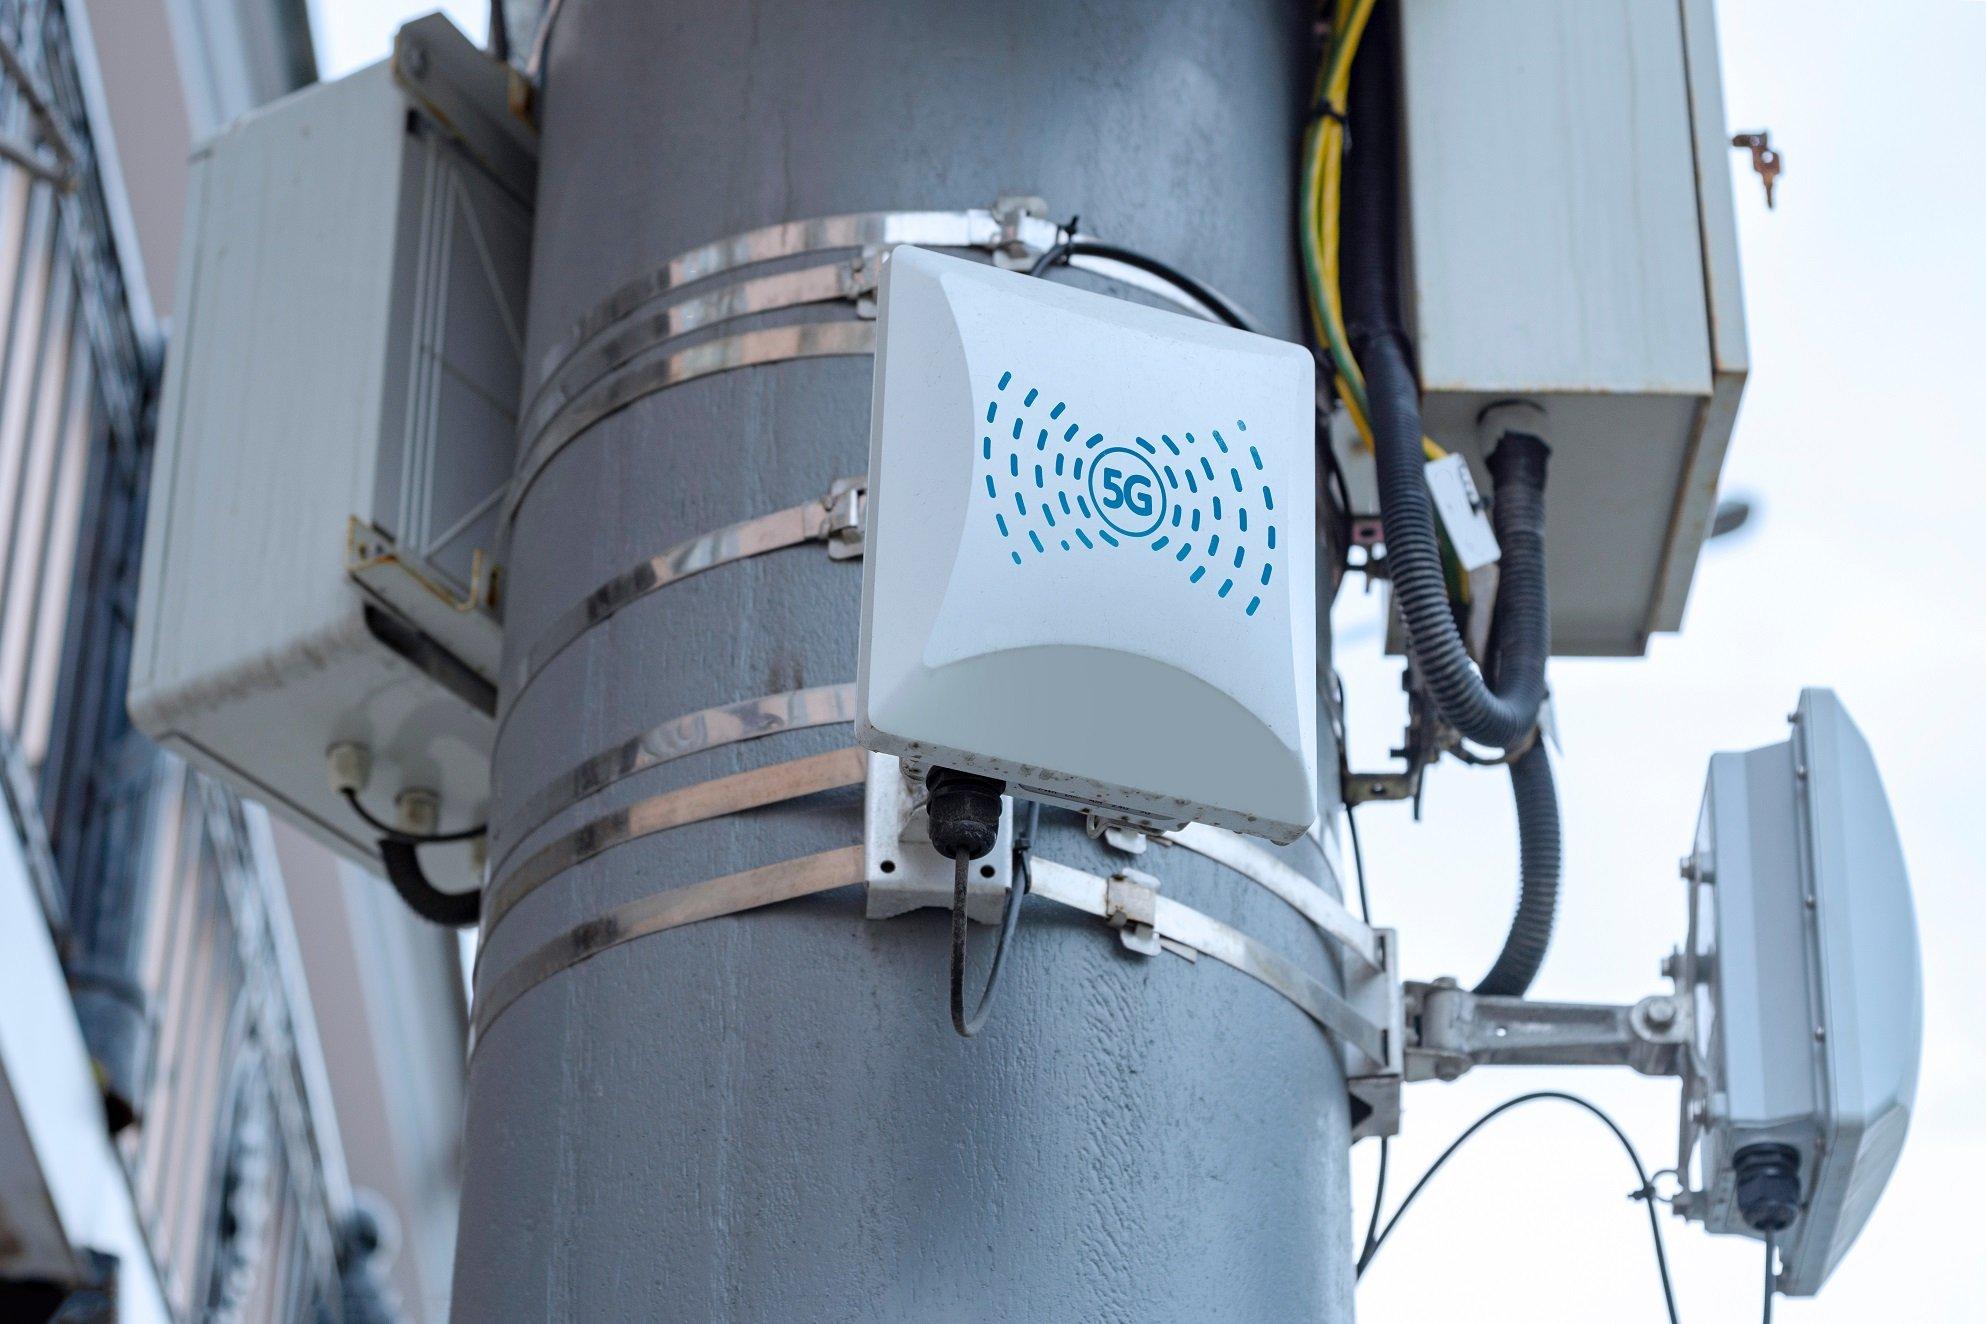 stck-5g-mmwave-antenna